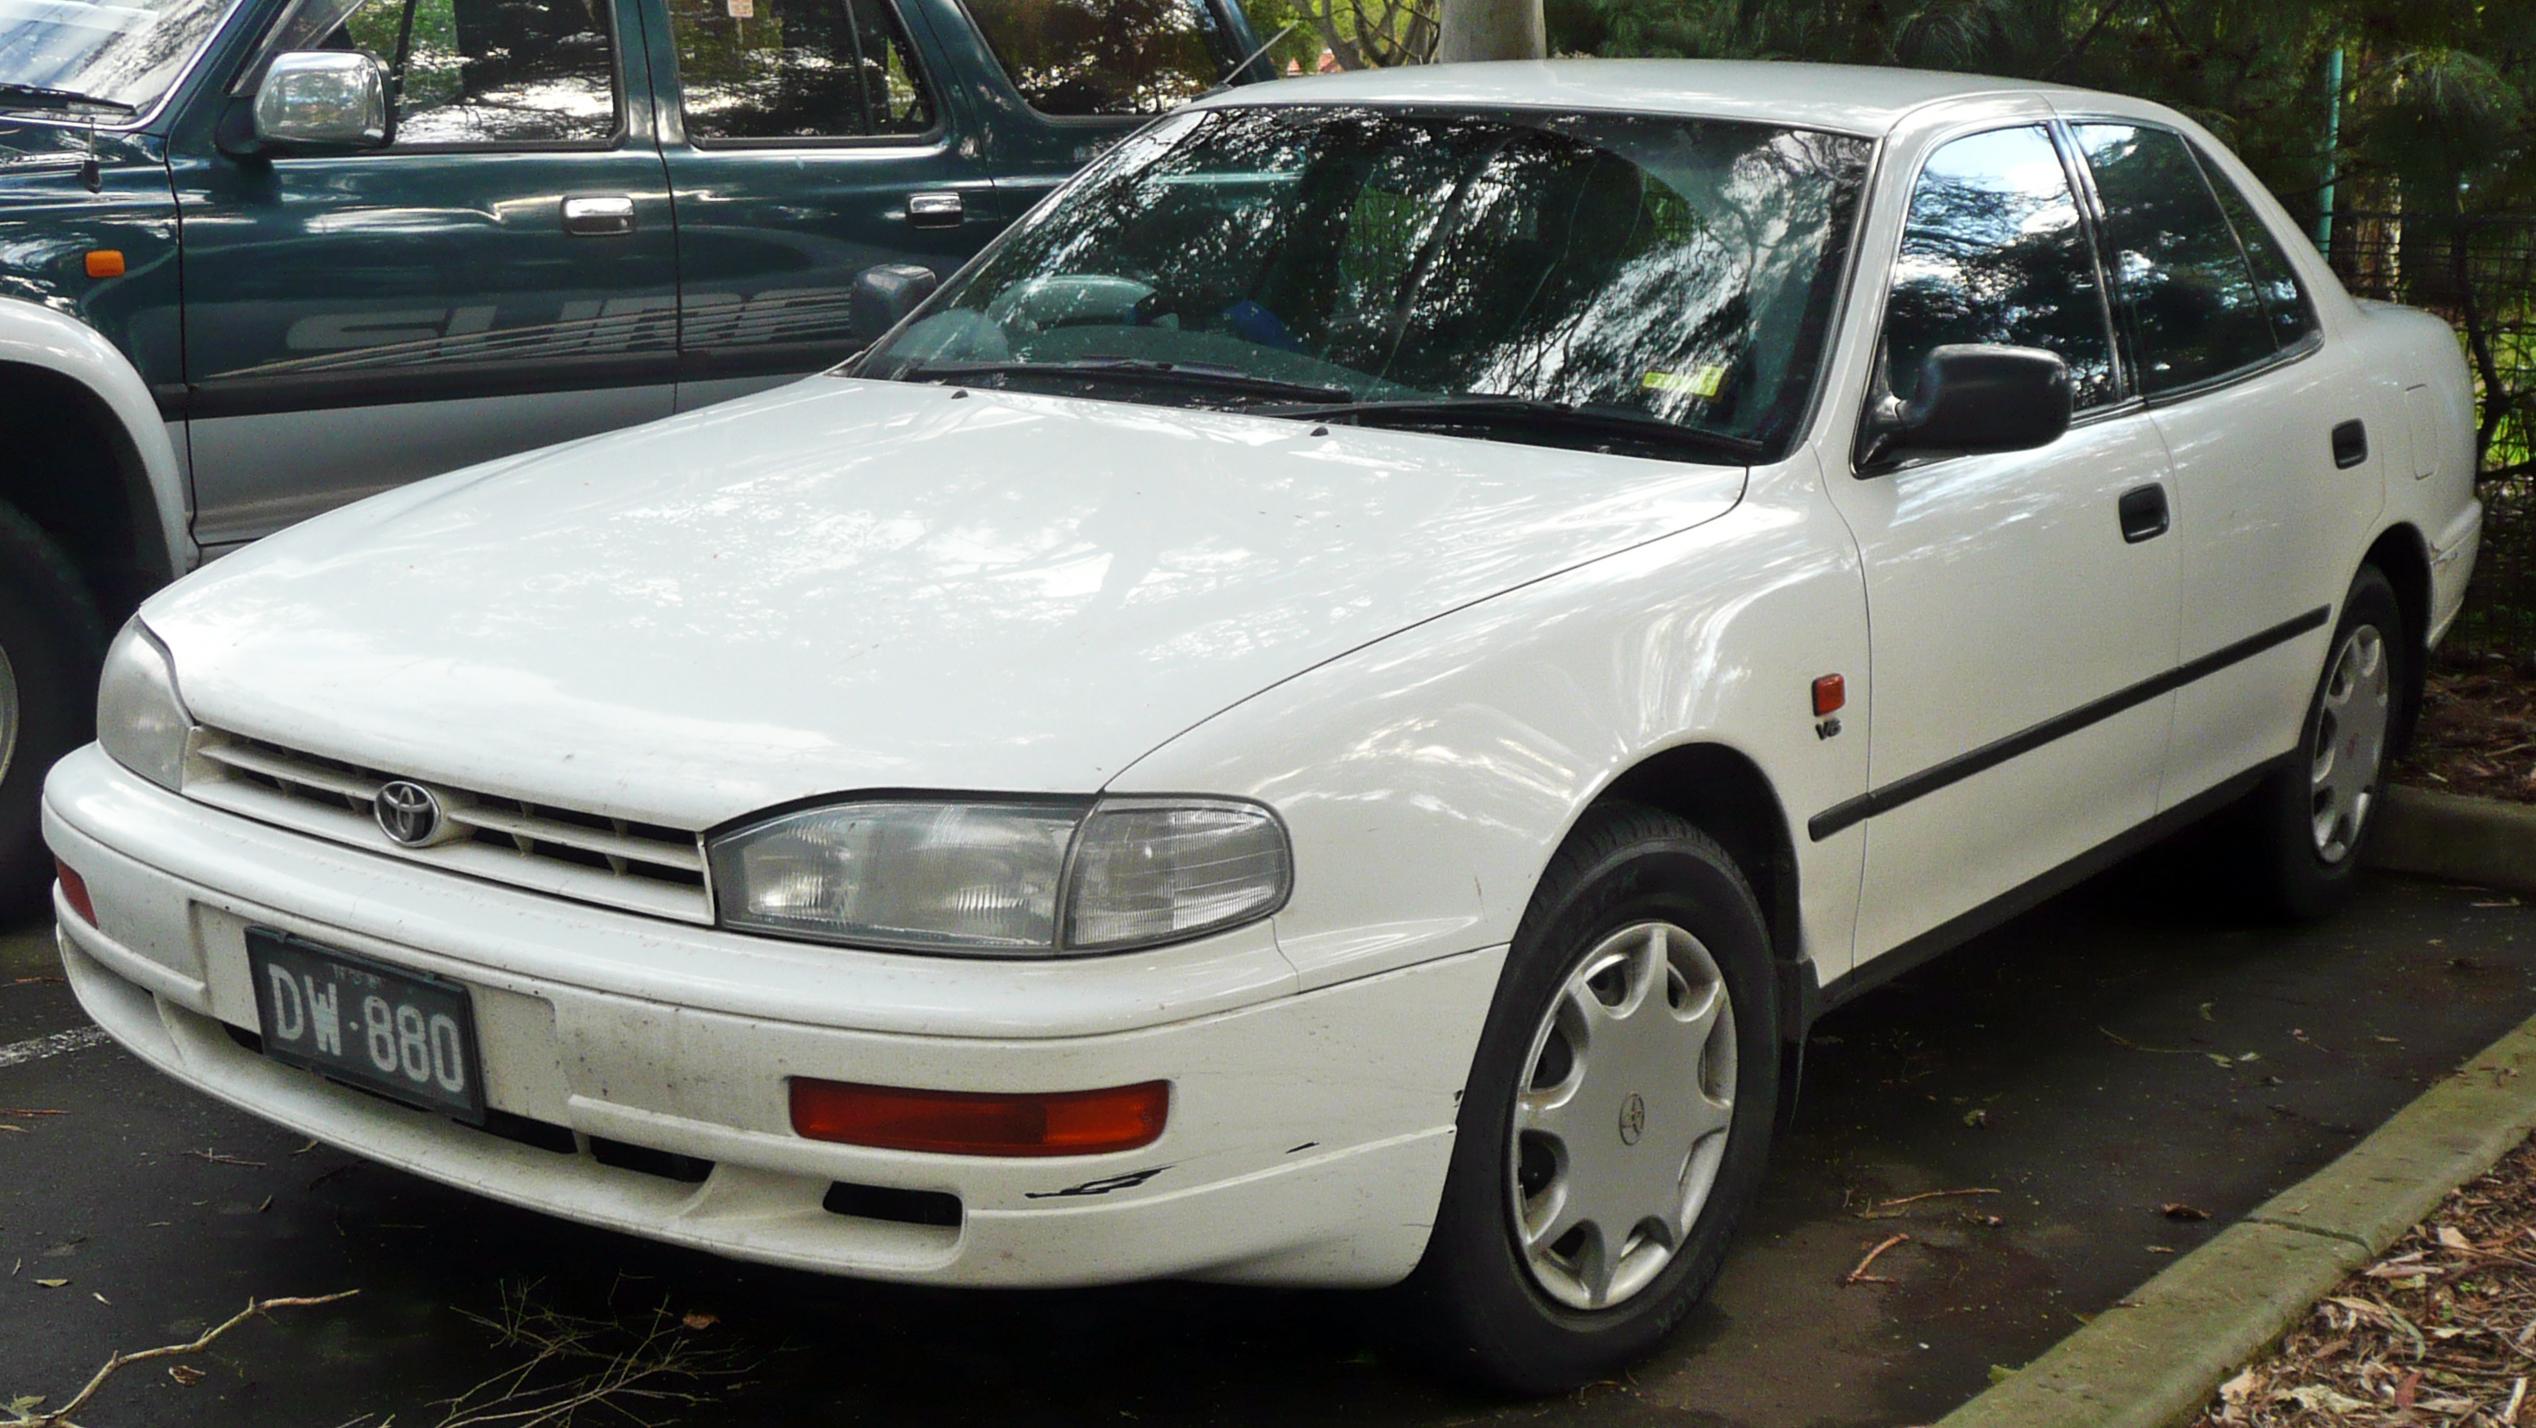 File 1993 1994 toyota camry vienta vdv10 executive sedan 03 jpg